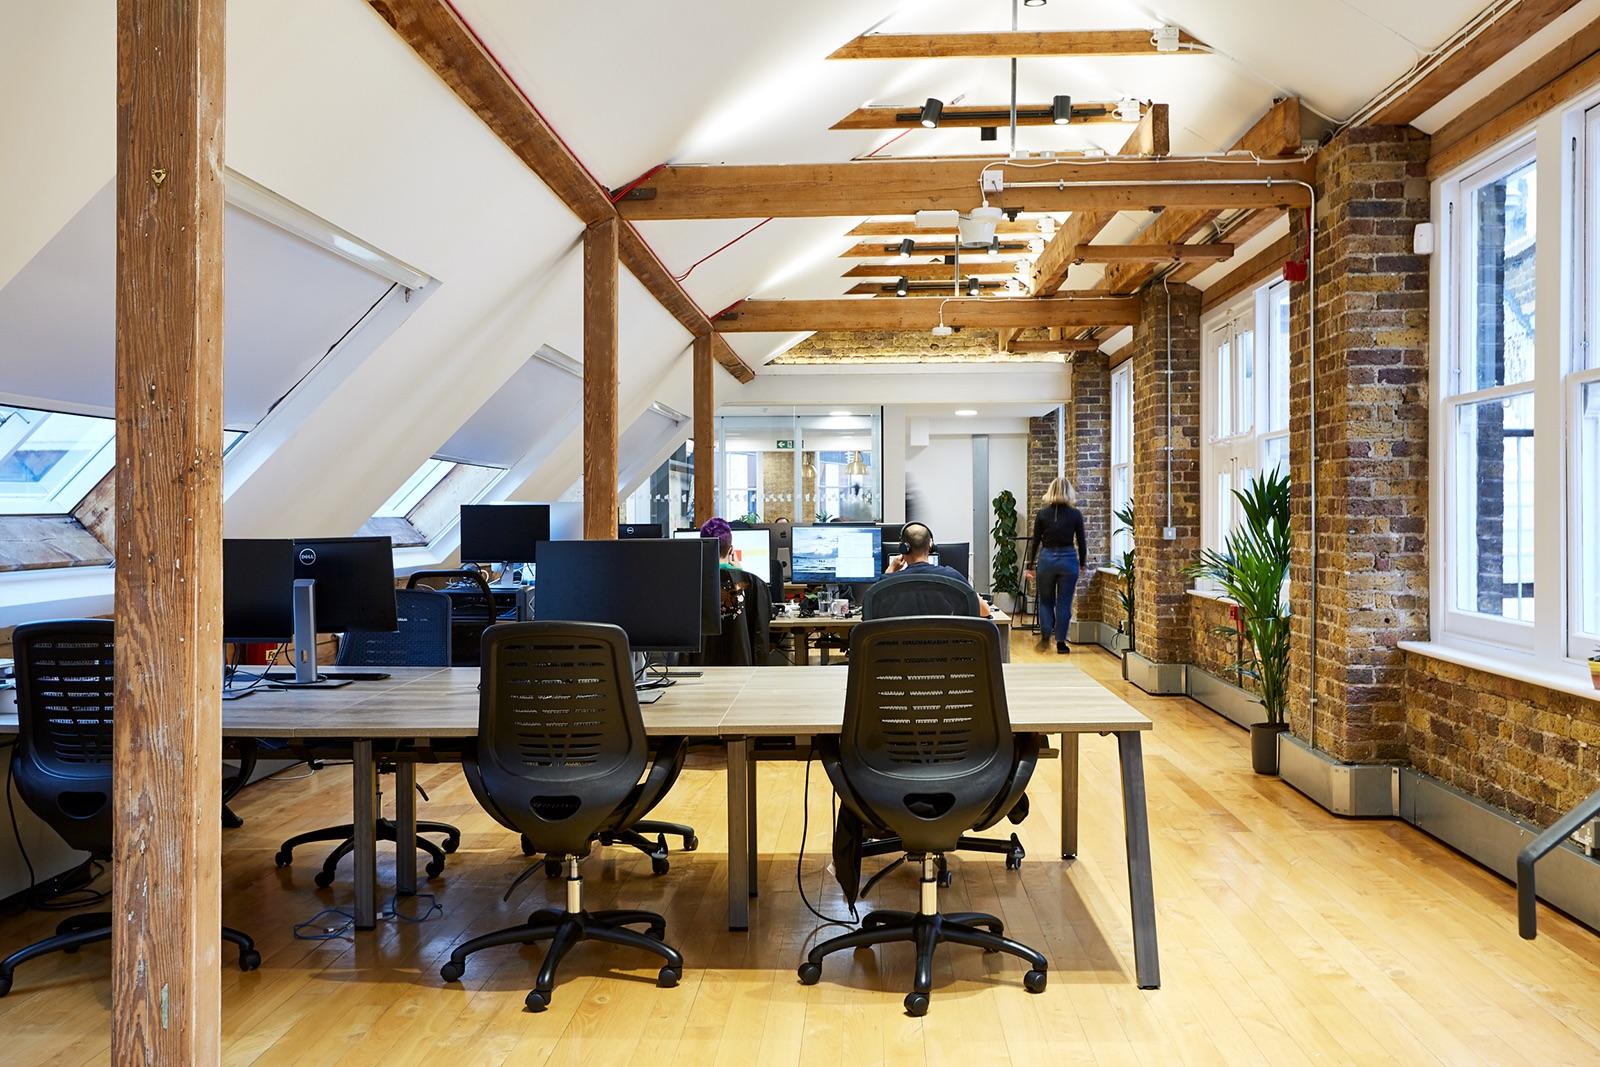 hutch-shoreditch-office-10